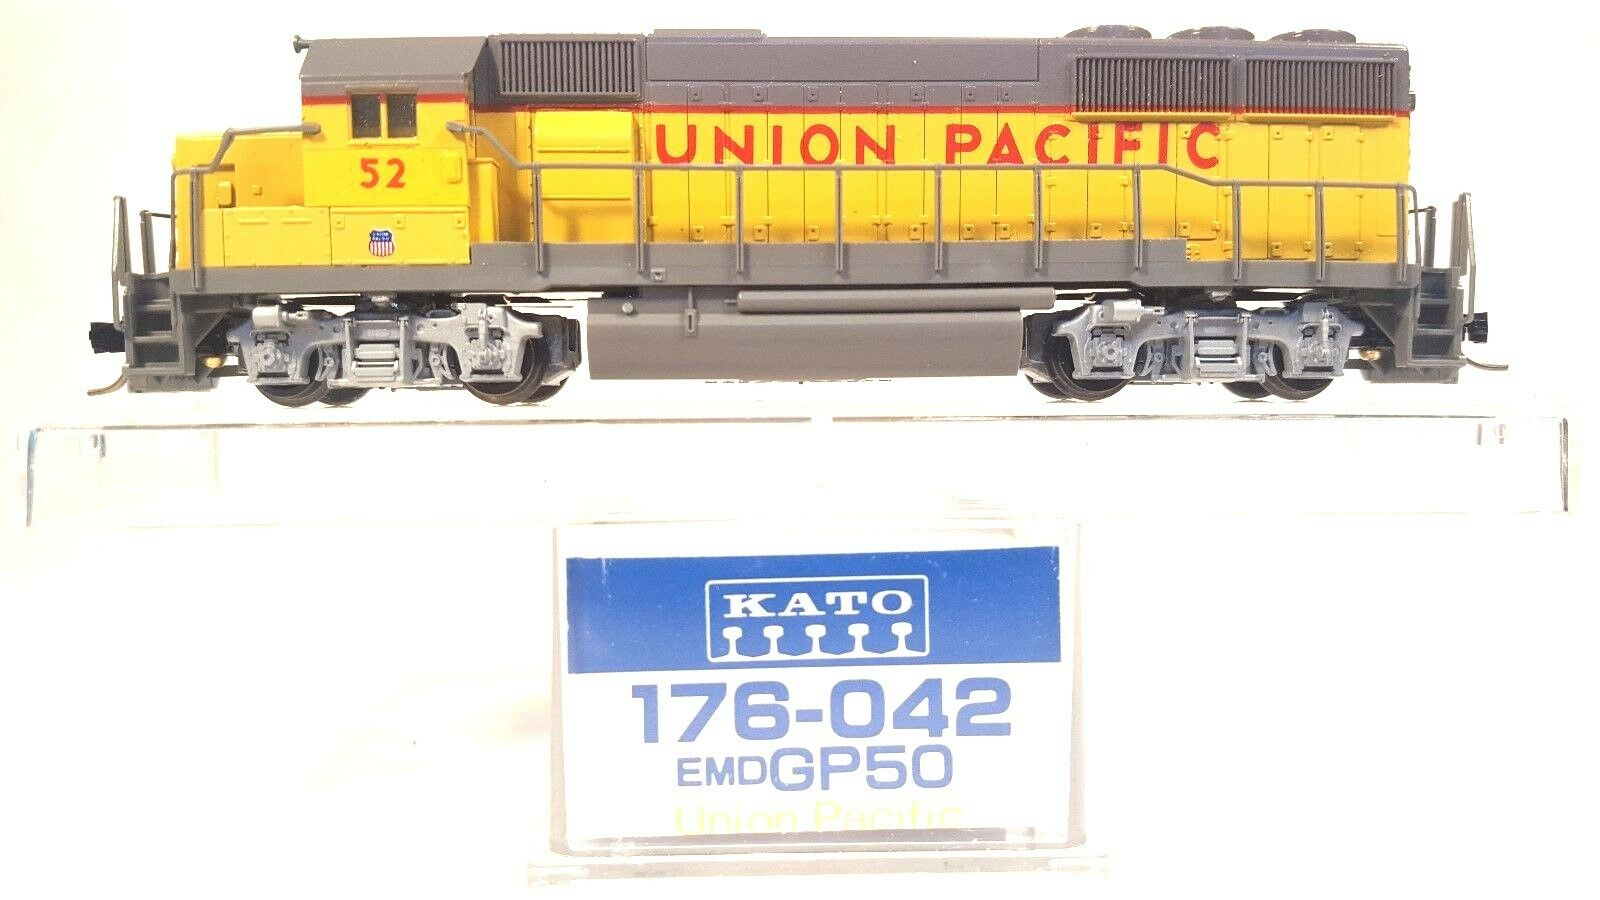 N Kato 176-042 EMD GP50 Union Pacific Locomotive  52  Tested